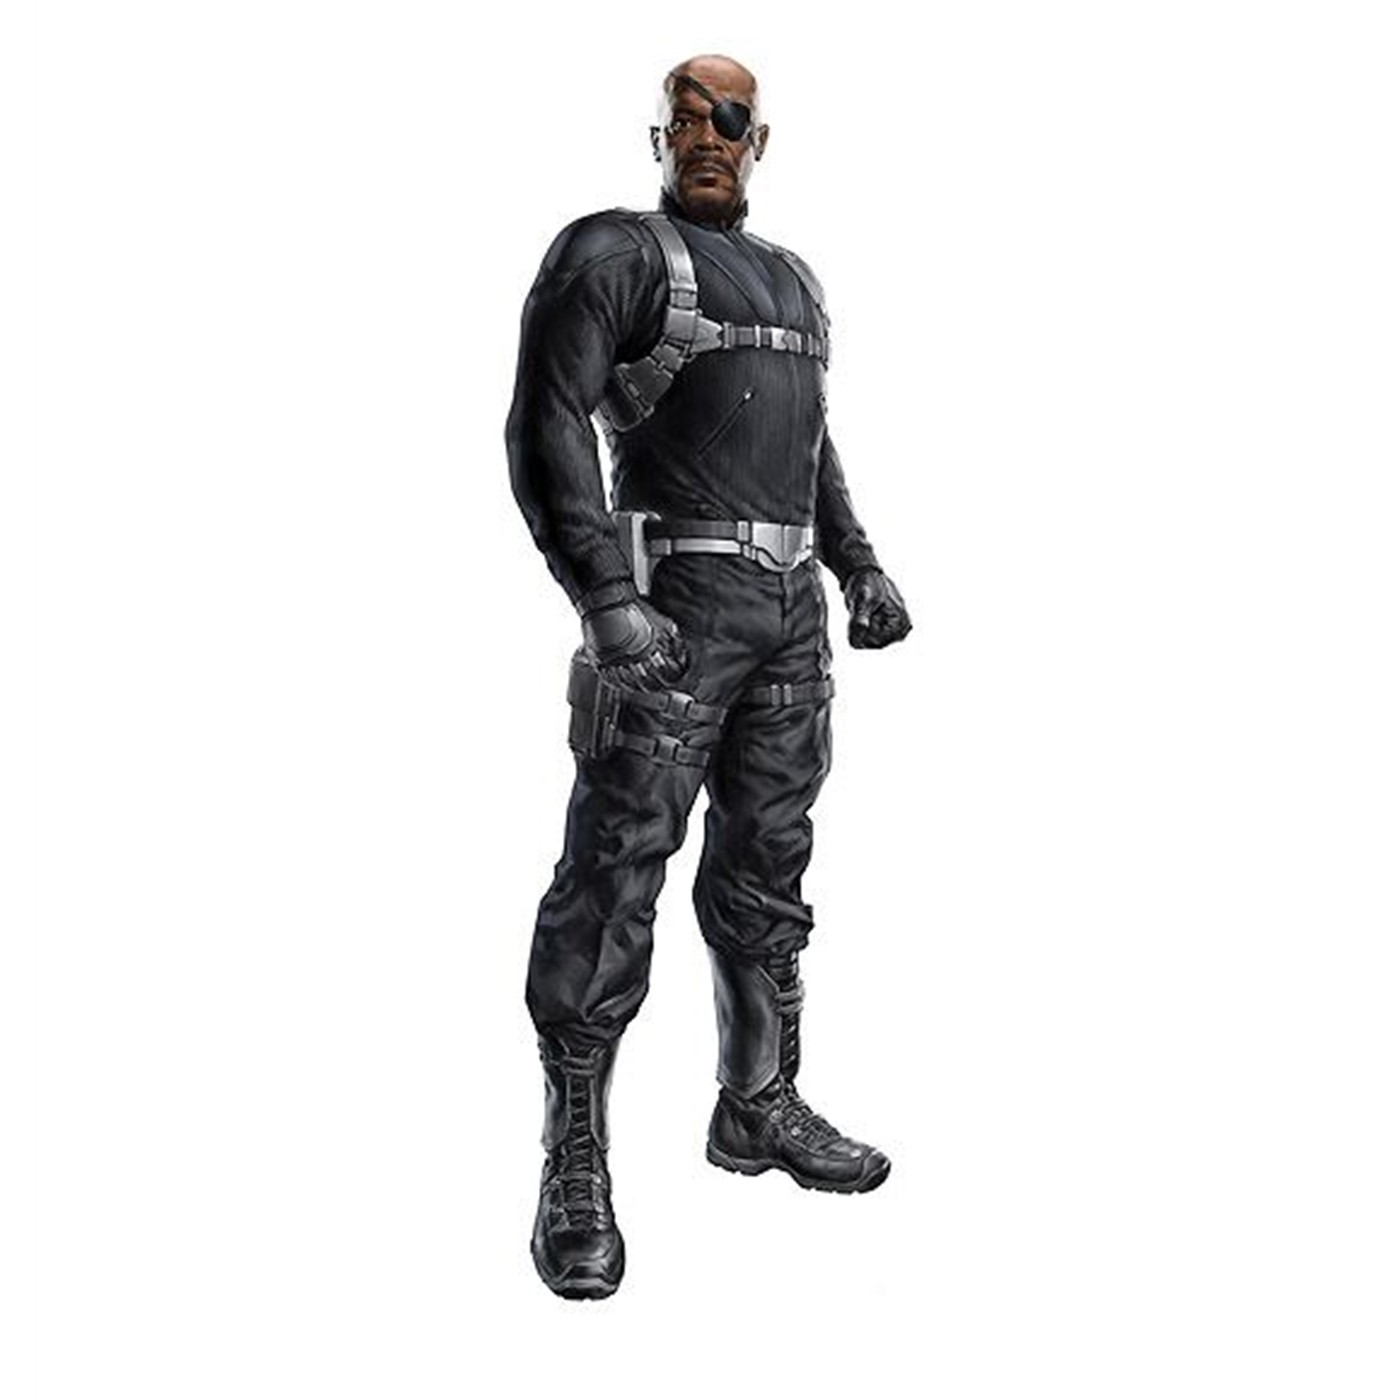 The Avengers Movie Nick Fury Cardboard Standup